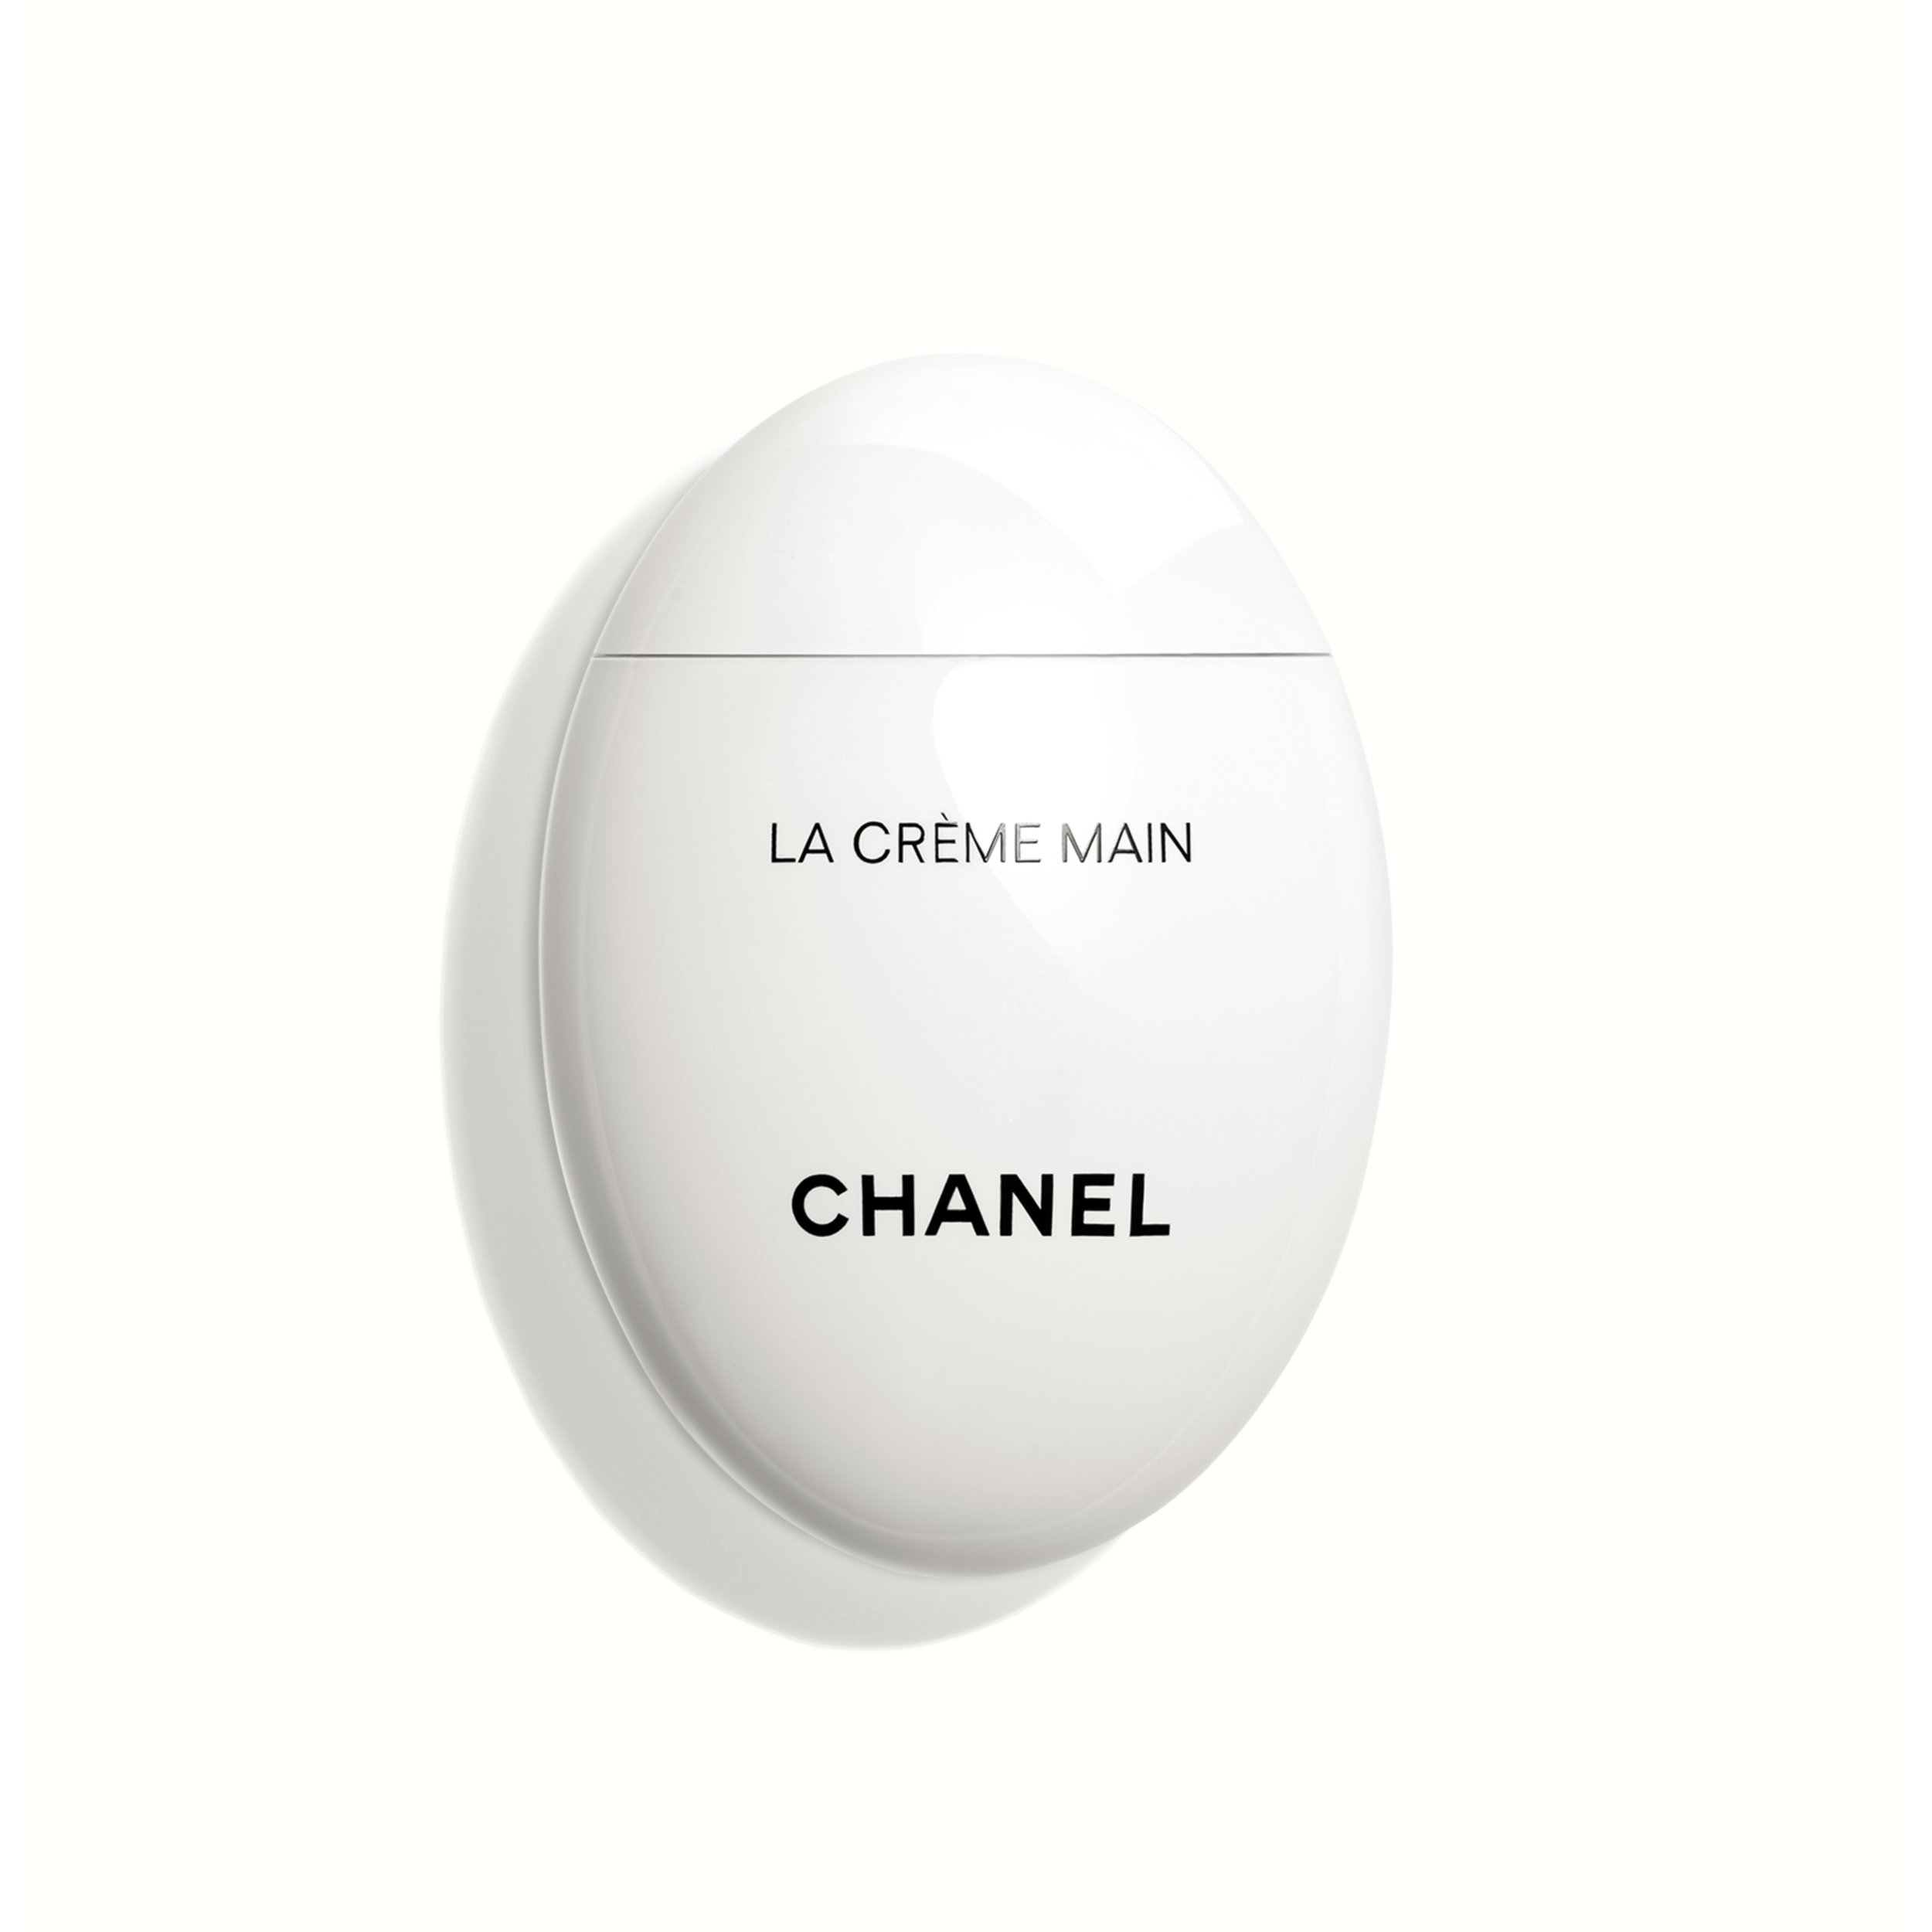 Chanel_Hand_Cream_JLBABE.jpg